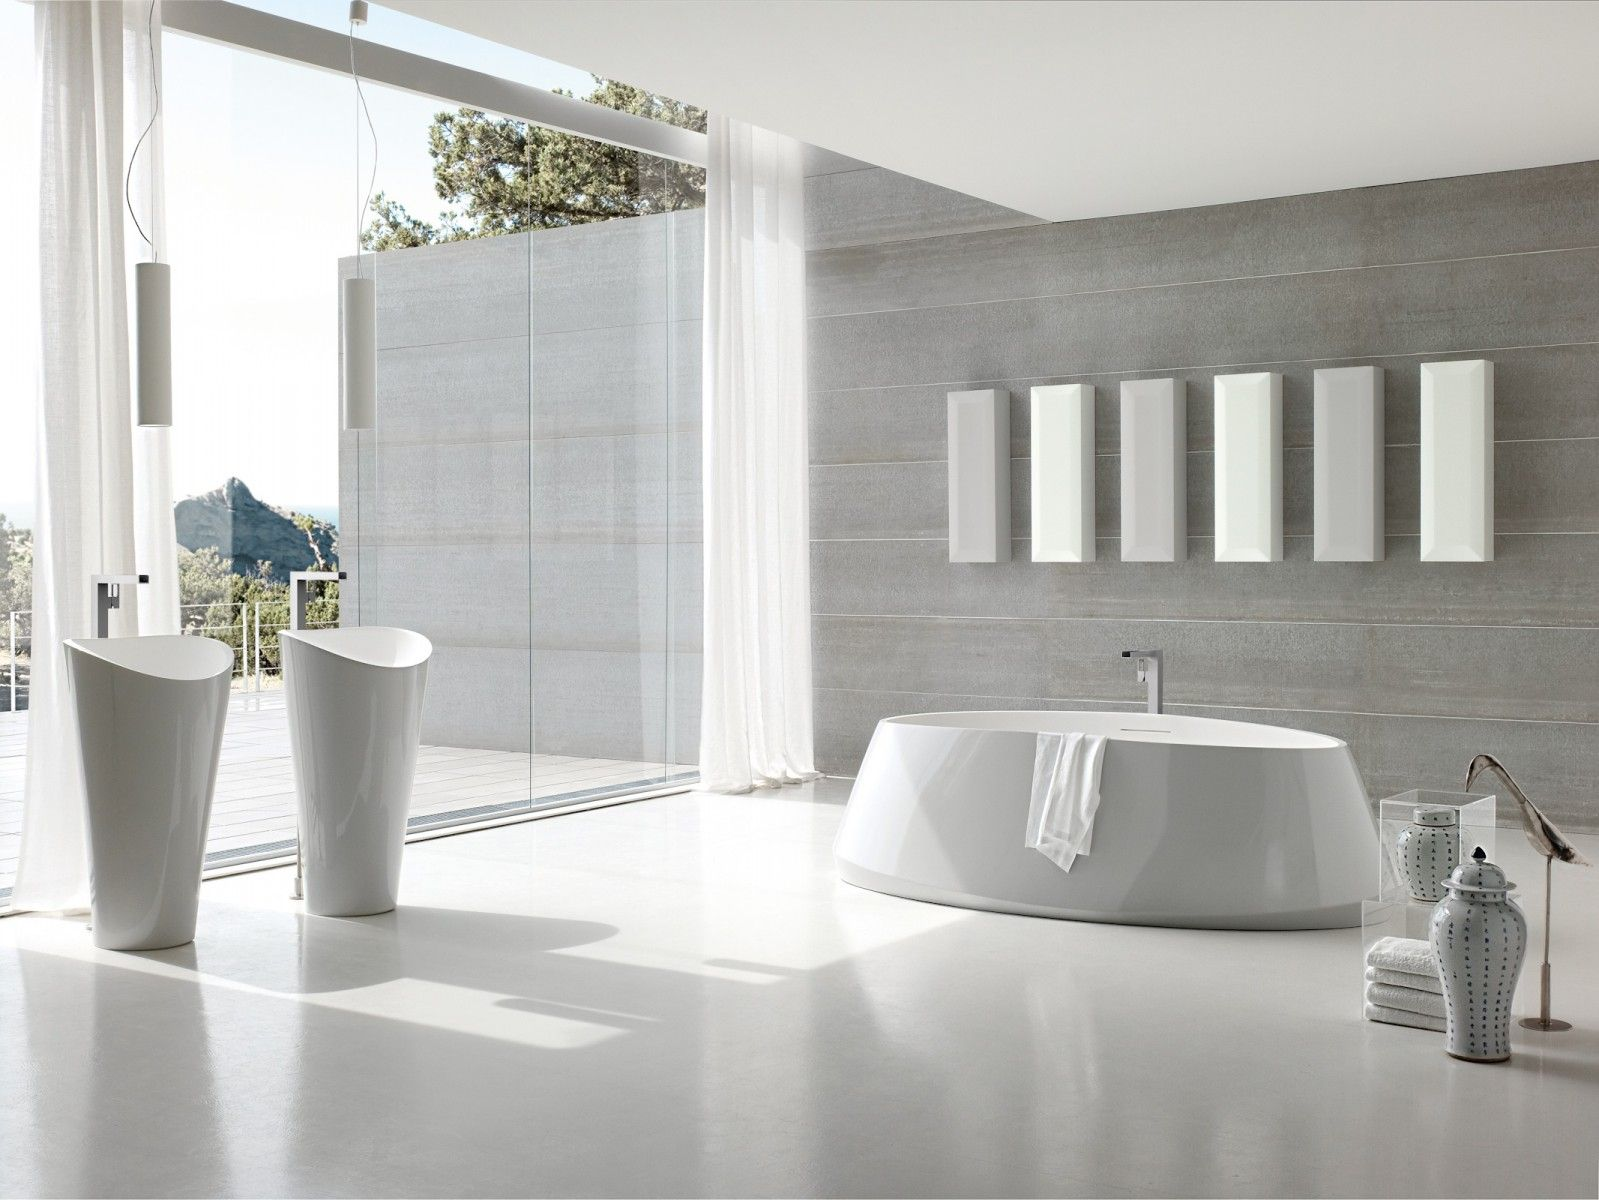 http://cdn.home-designing.com/wp-content/uploads/2014/03/27-High-end-bathroom-design.jpg